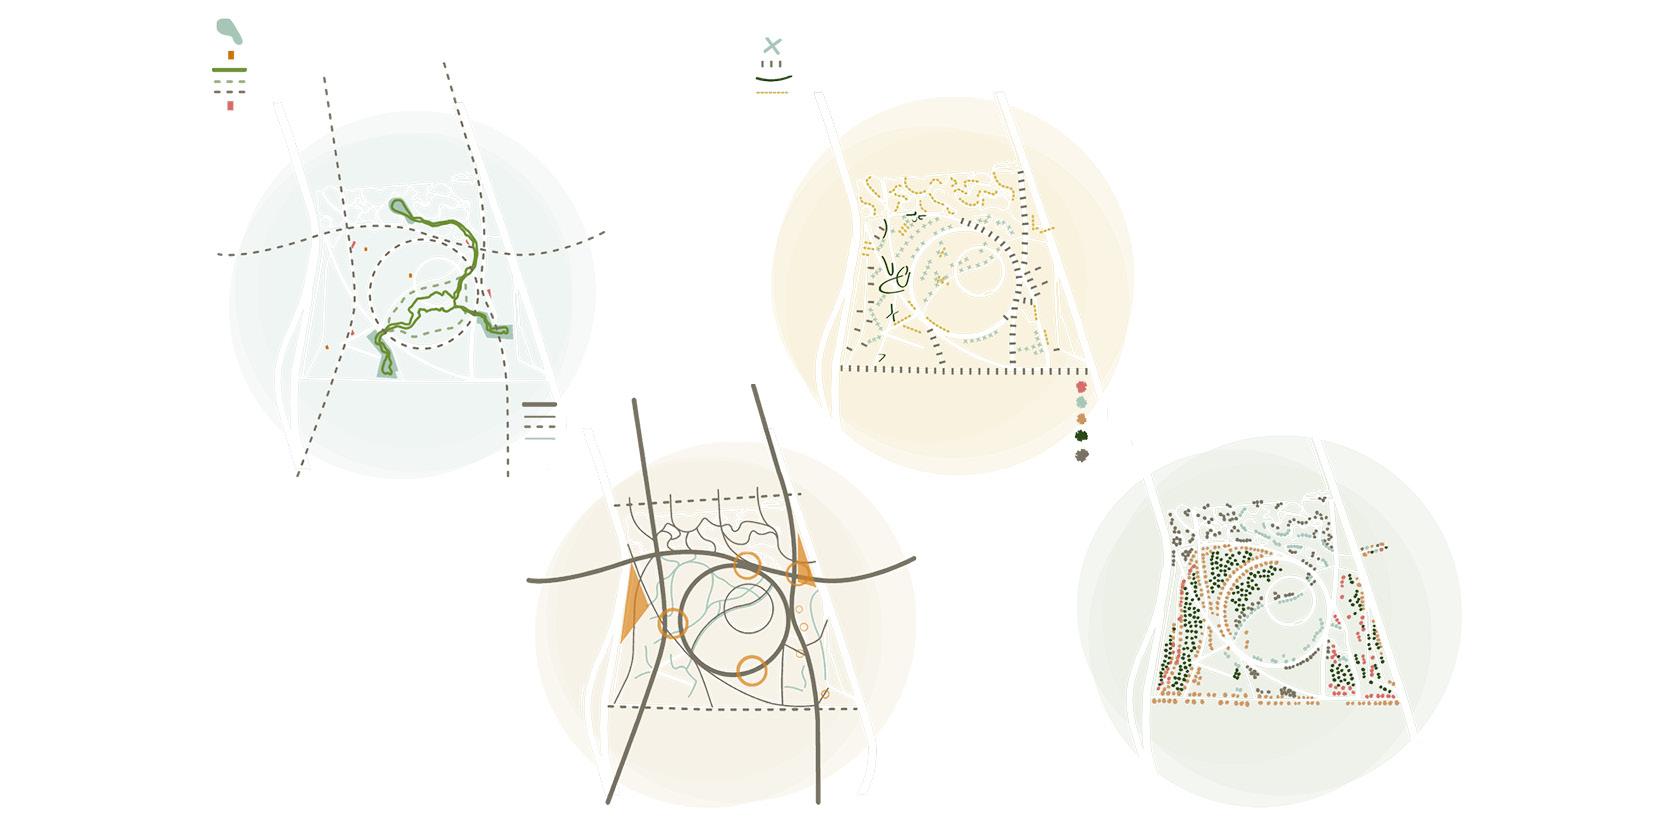 OCA architects Coziness Valley Долина Уюта competition Murmansk region Hernan Lleida Ruiz Bernardo Garcia Morales Miquel Perez Eric Moya18